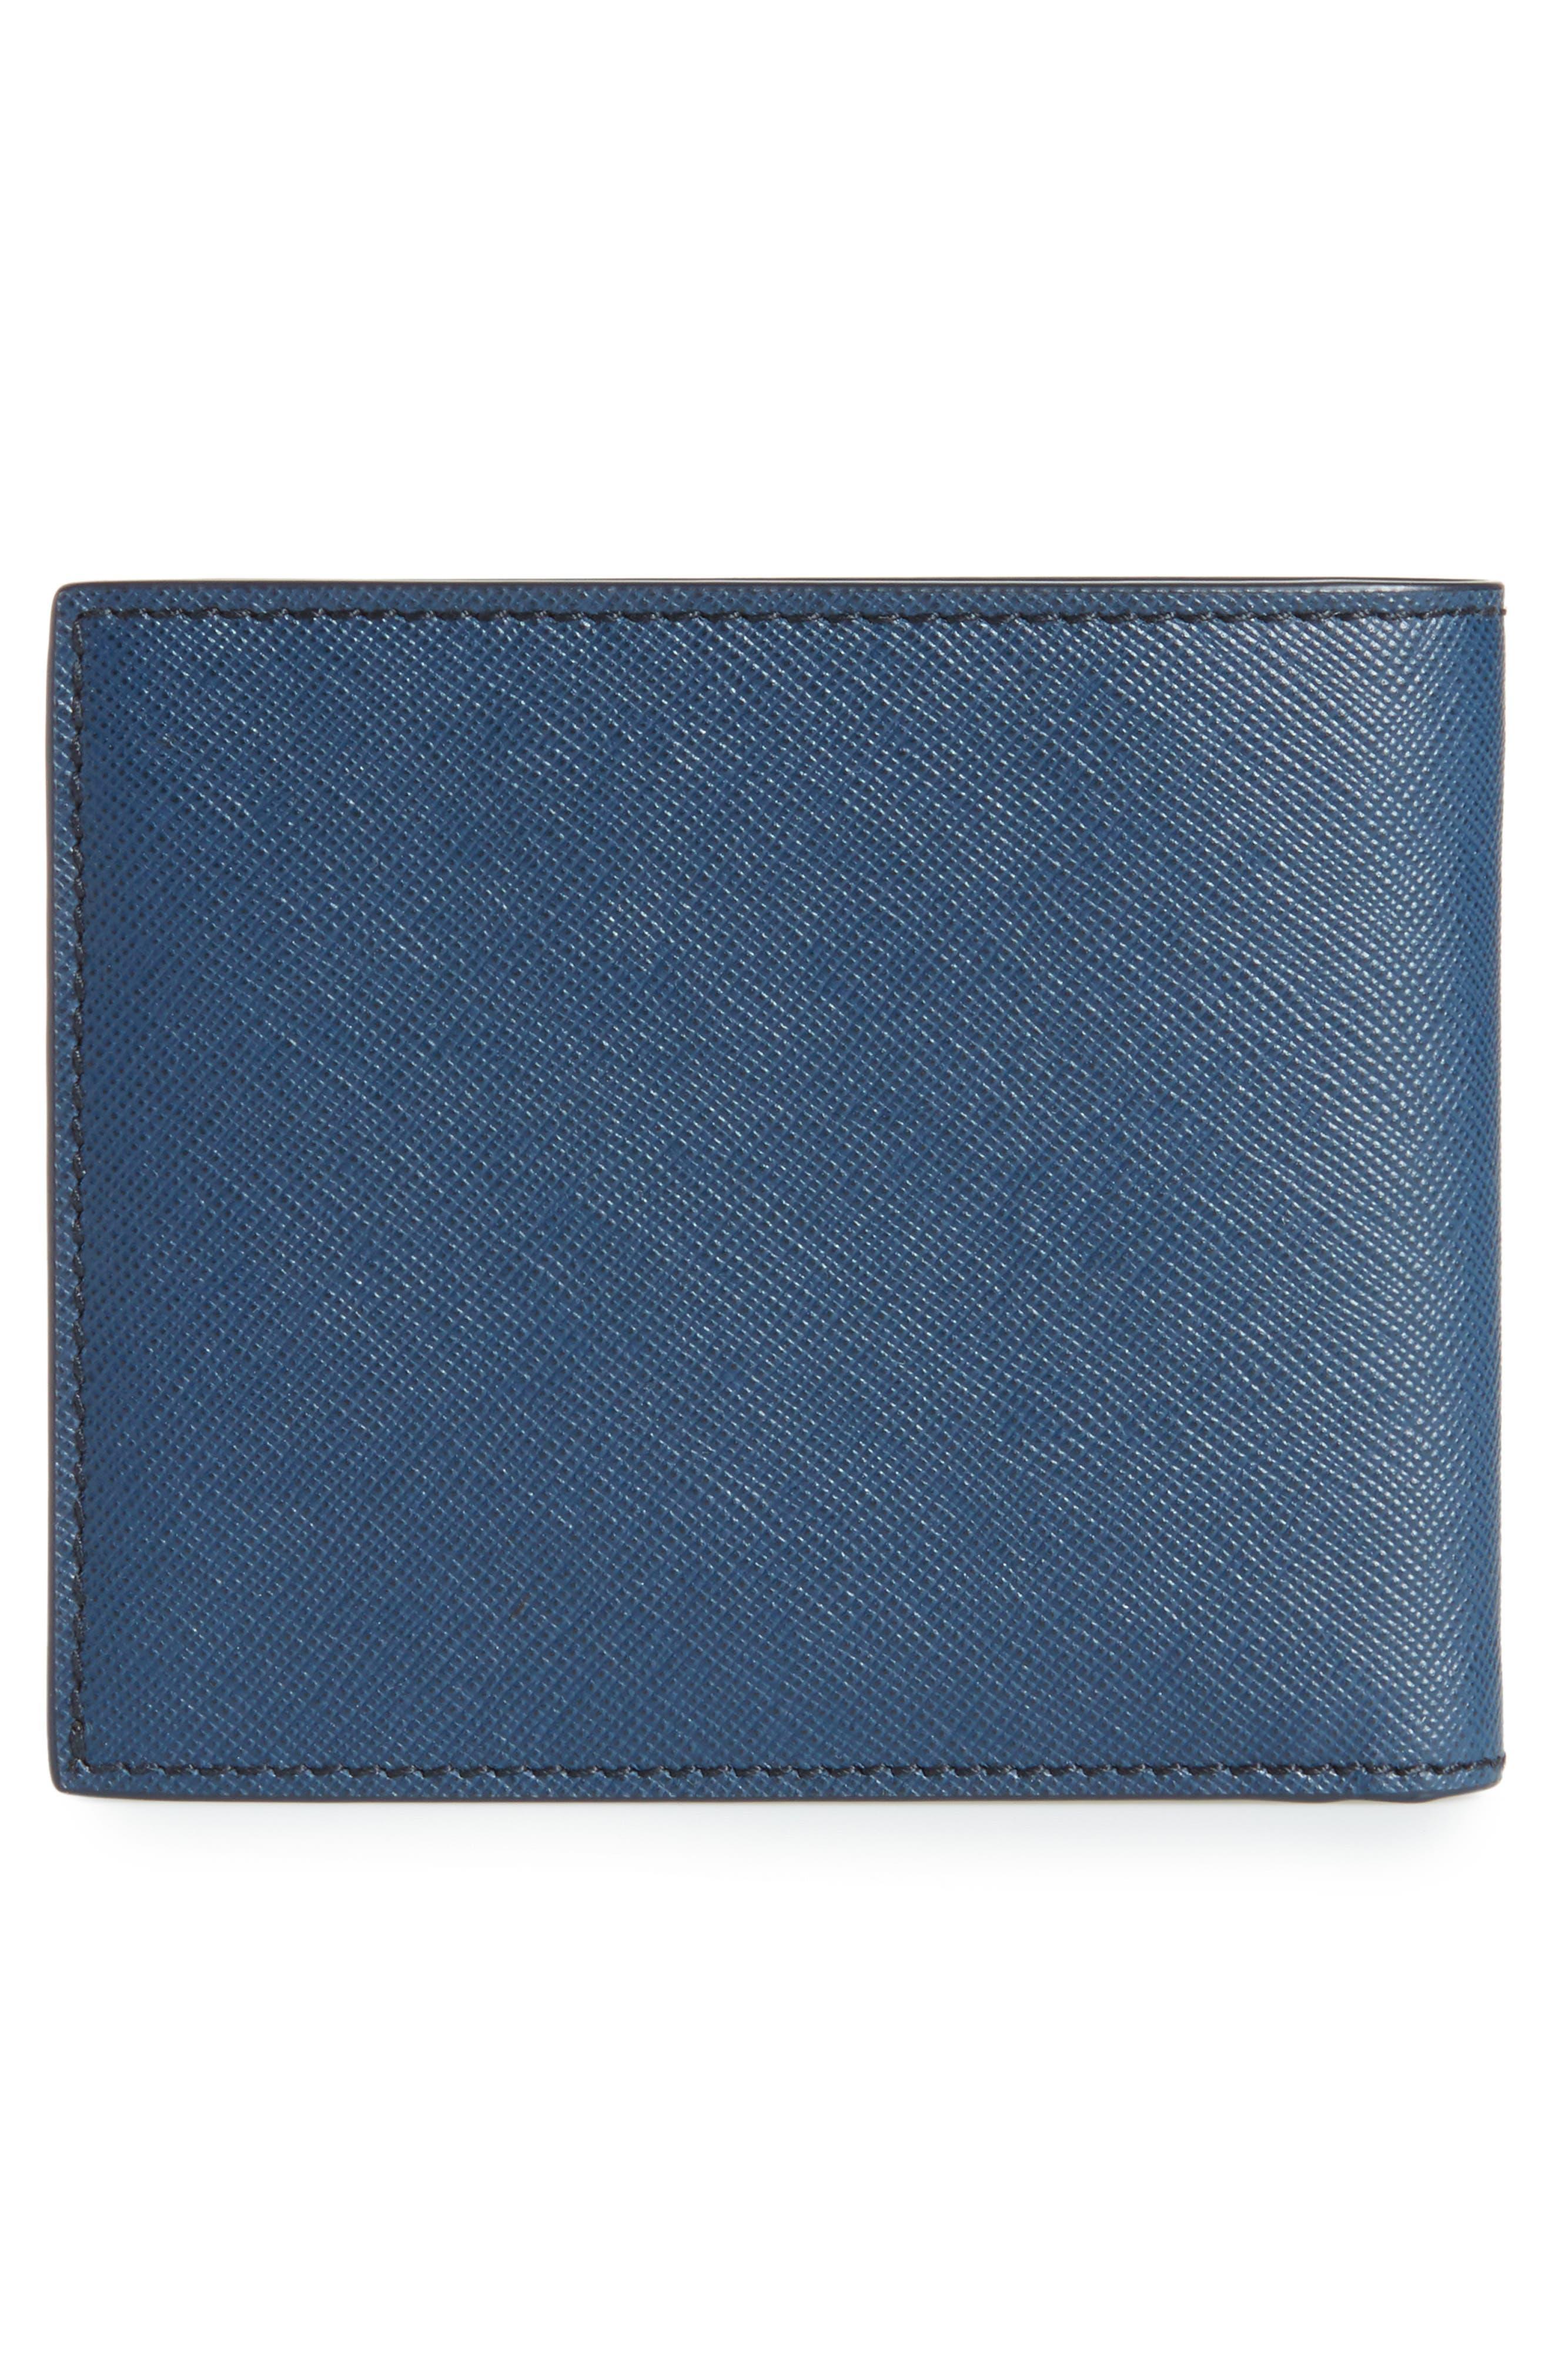 MONTBLANC, Sartorial Leather Wallet, Alternate thumbnail 3, color, INDIGO